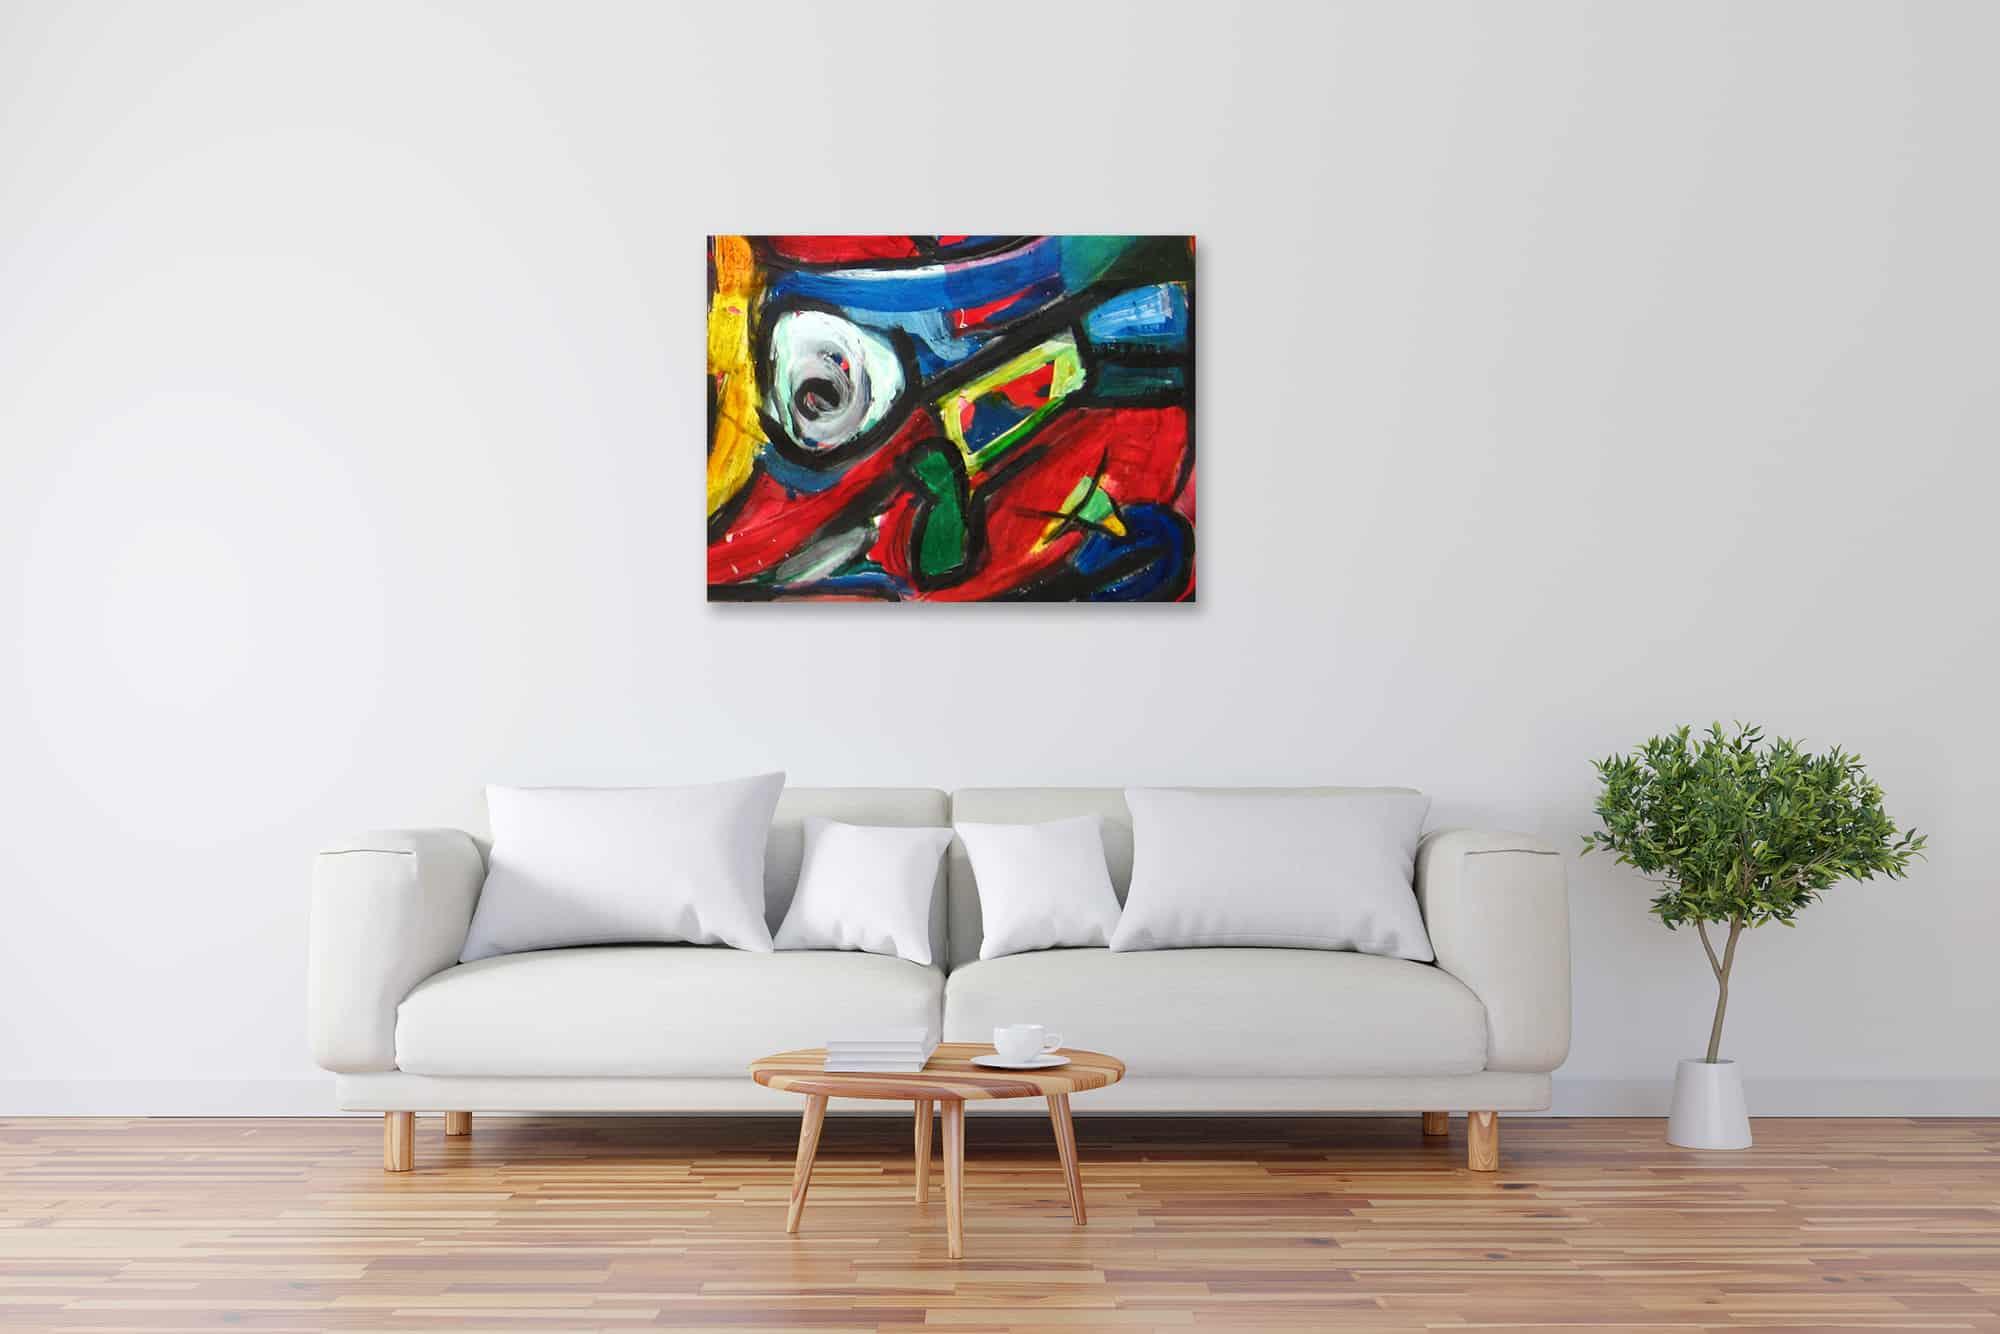 Modernes Acryl Gemälde expressive Formen wandbilder